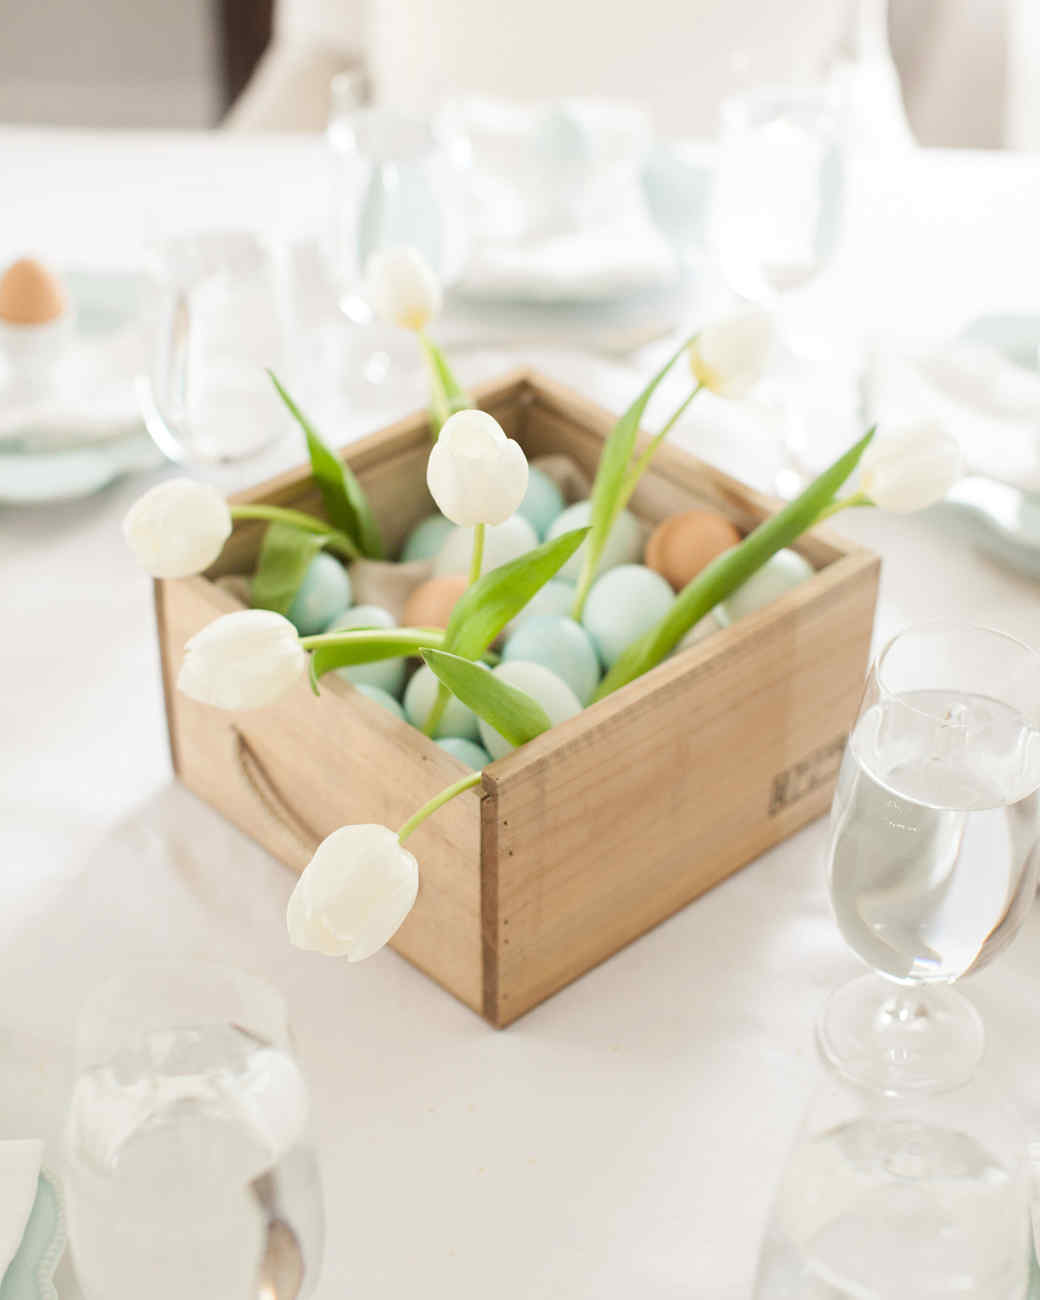 tulip-eggs-basket-centerpiece.jpg